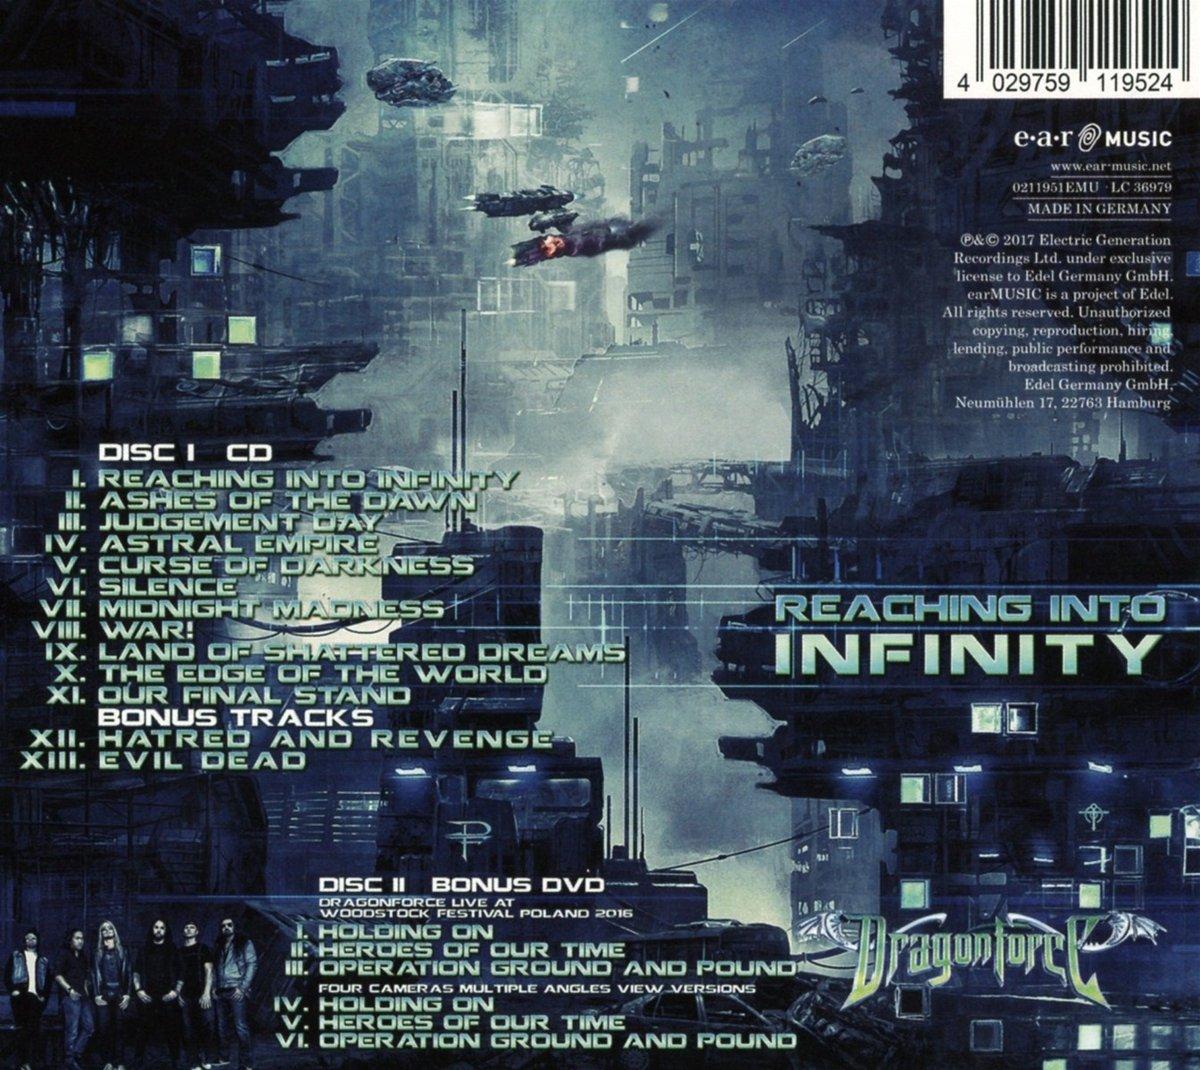 Reaching Into Infinity (Special Edition)   Dragonforce: Amazon.de: Musik